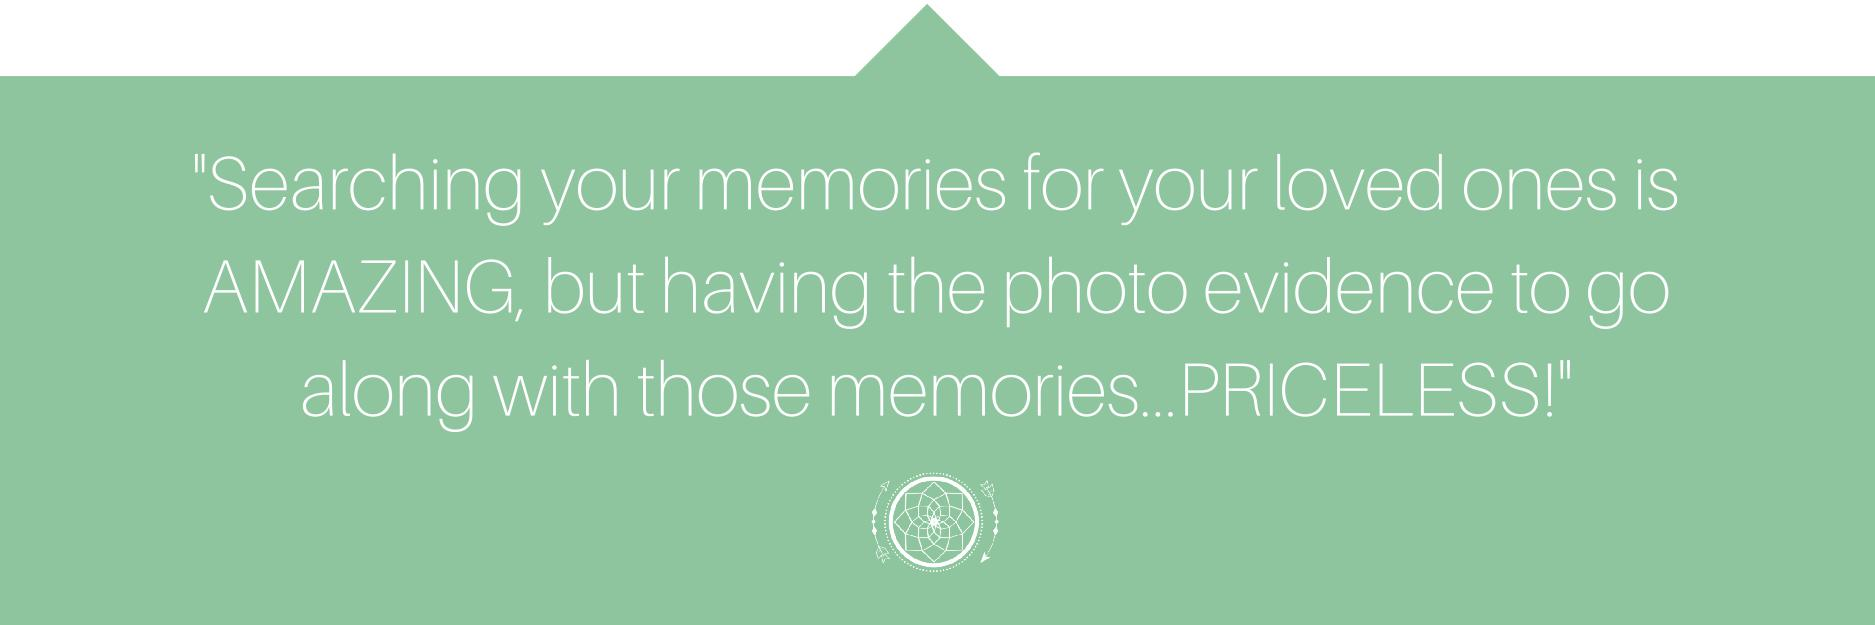 Elizabeth-simpson-quote-simpson-photogrpahy-simpsonography-memories.jpg